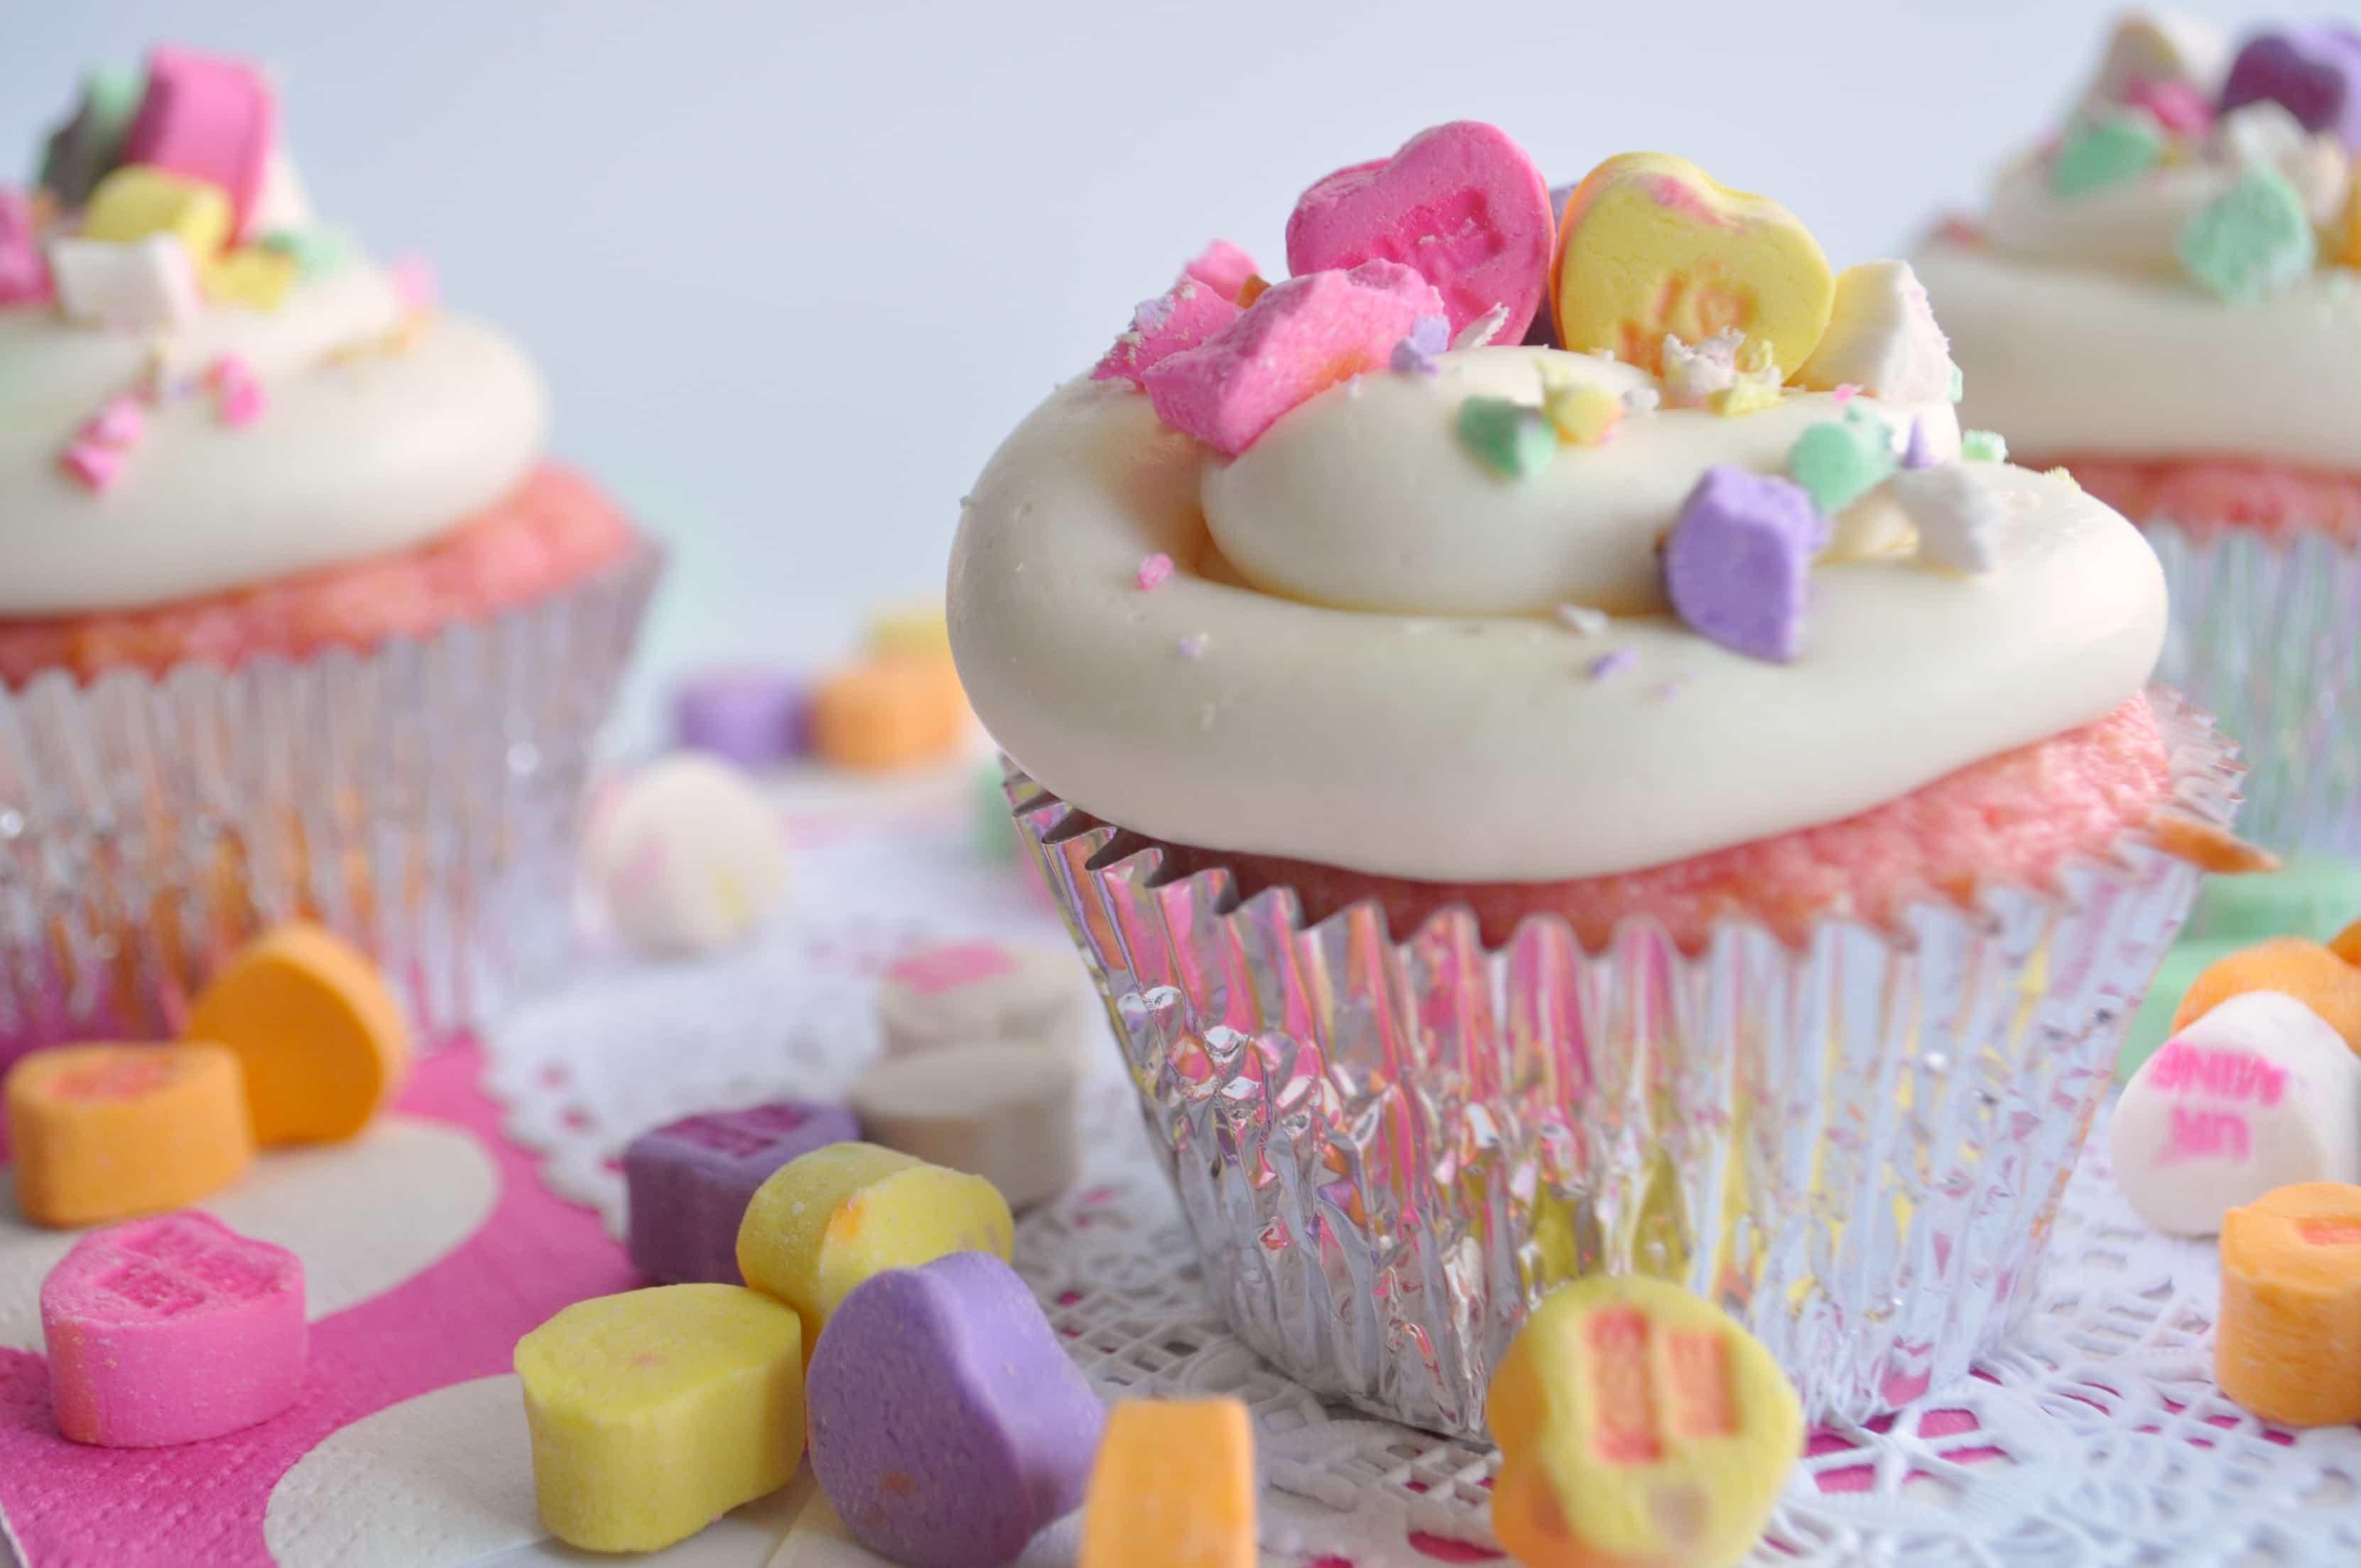 Valentine's Day Cupcake decorating ideas |House of Yumm|